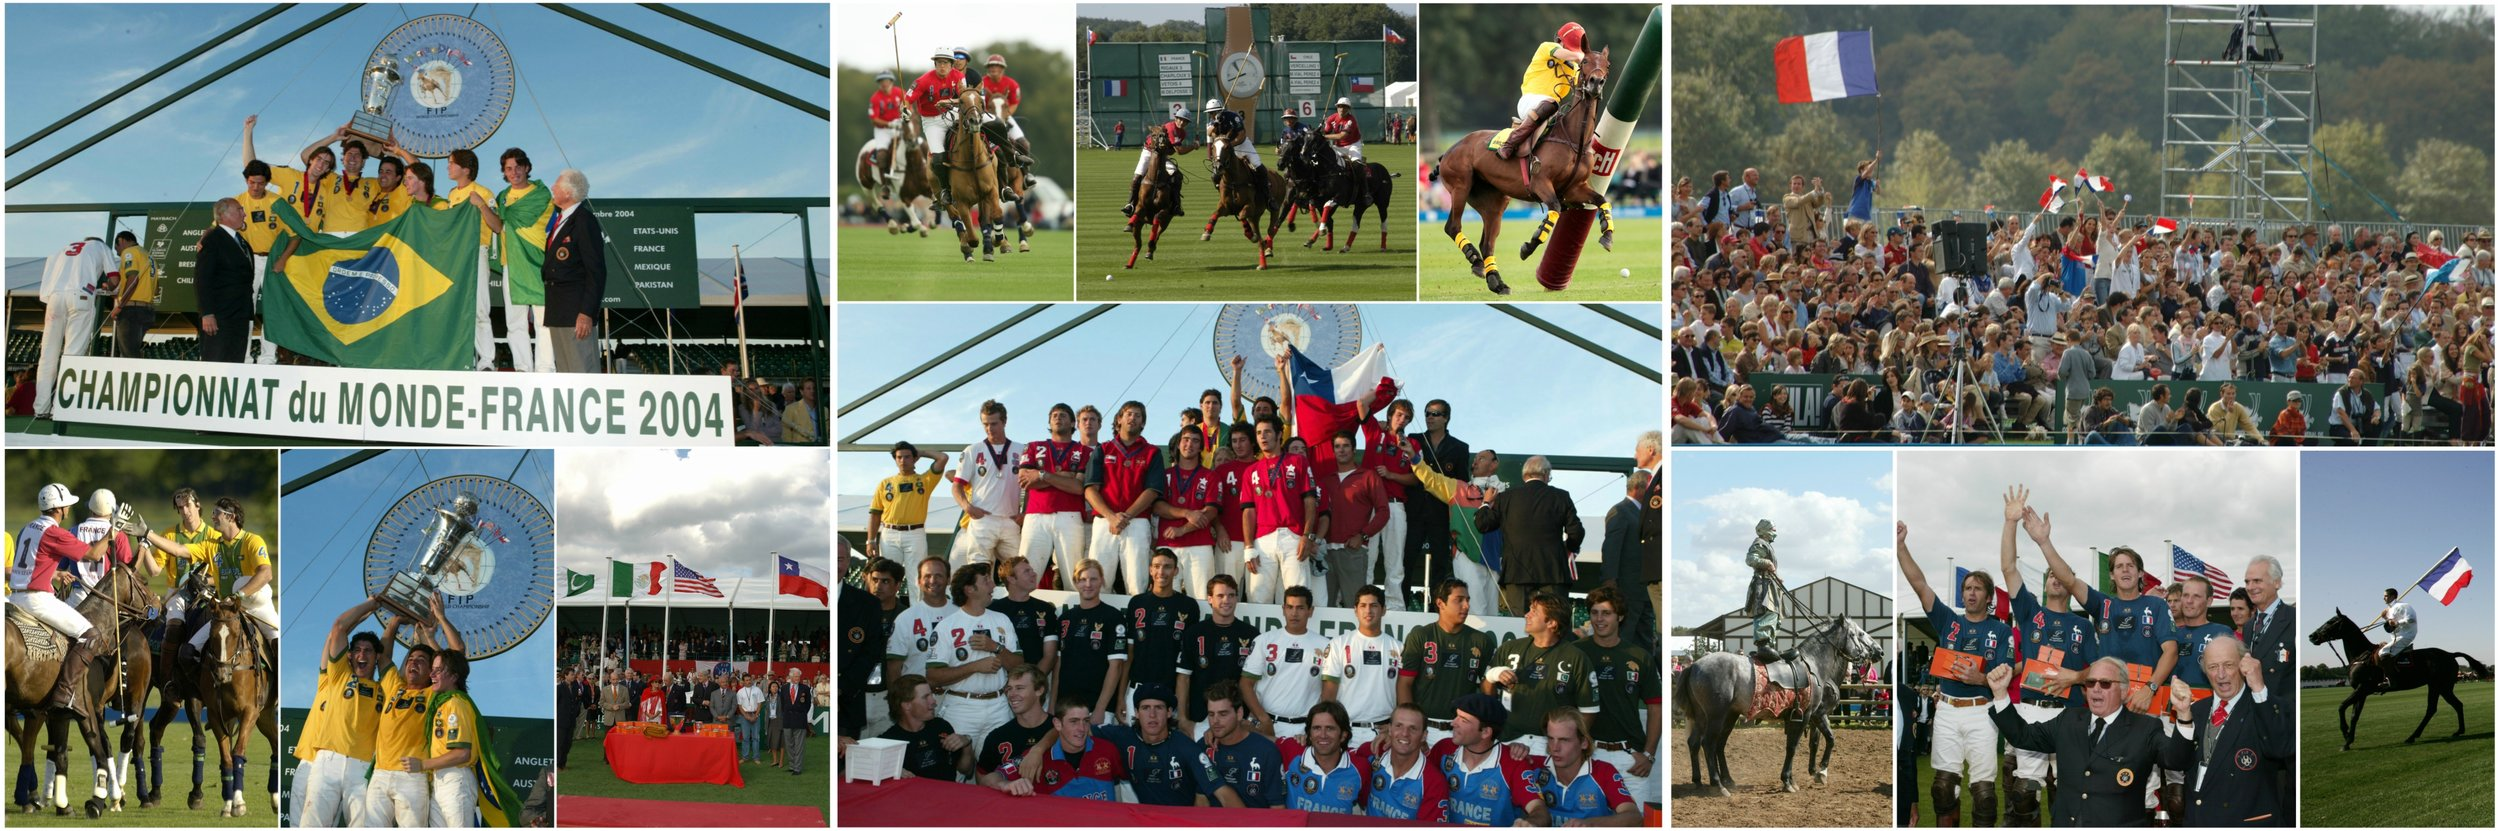 Les meilleurs moments du Championnat du Monde 2004 qui ont eu lieu au Polo Club du Domaine de Chantilly The best-of of the World Polo Championship which occured in 2004 at Chantilly Polo Club